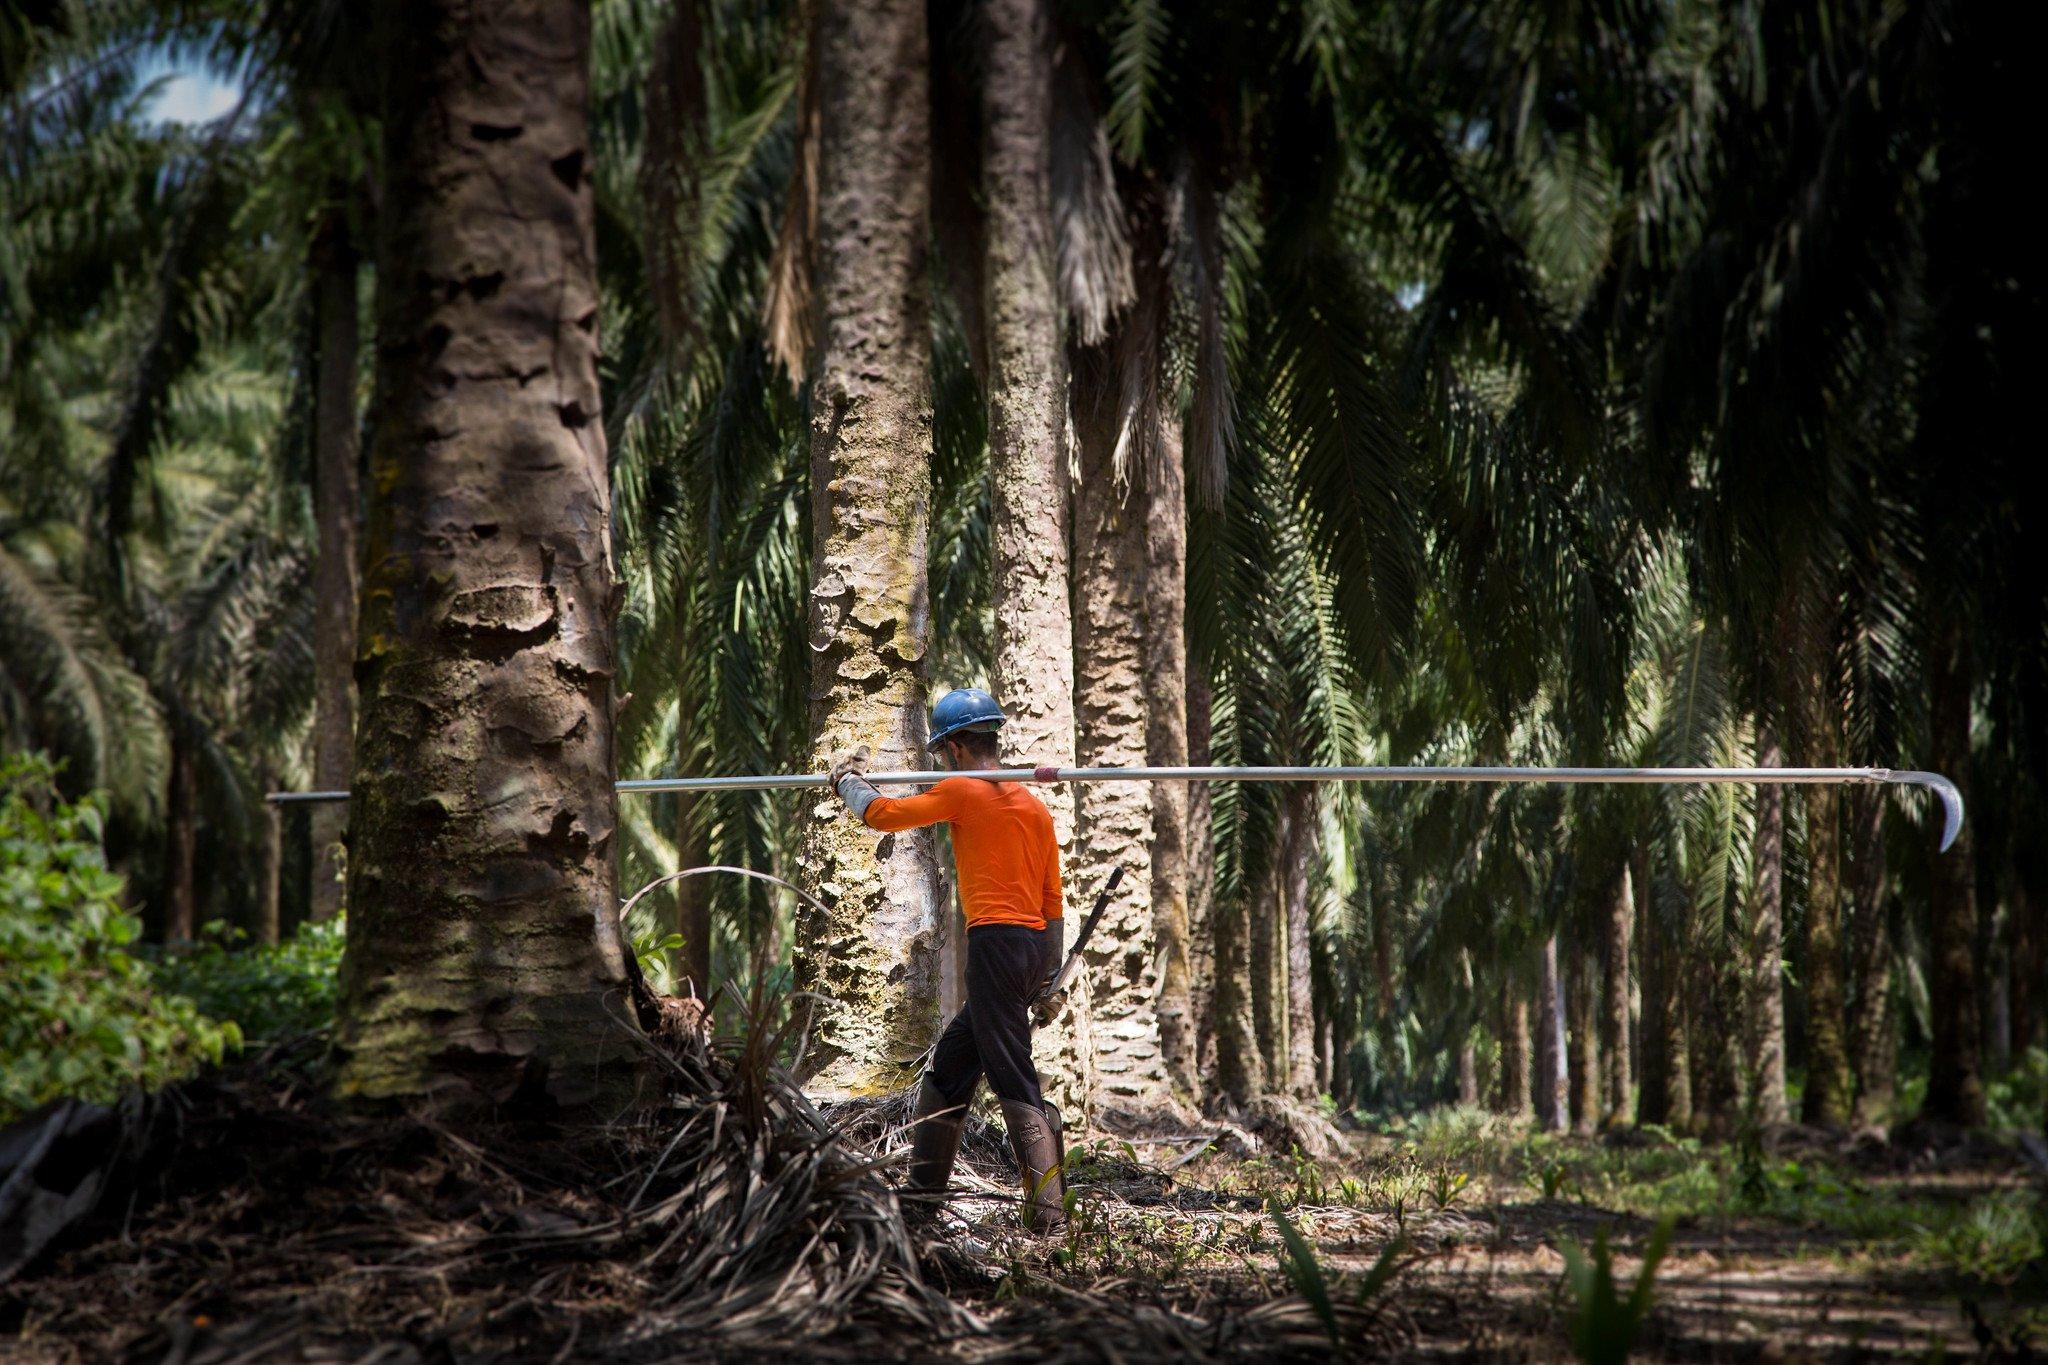 Palm oil factory worker, Brazil